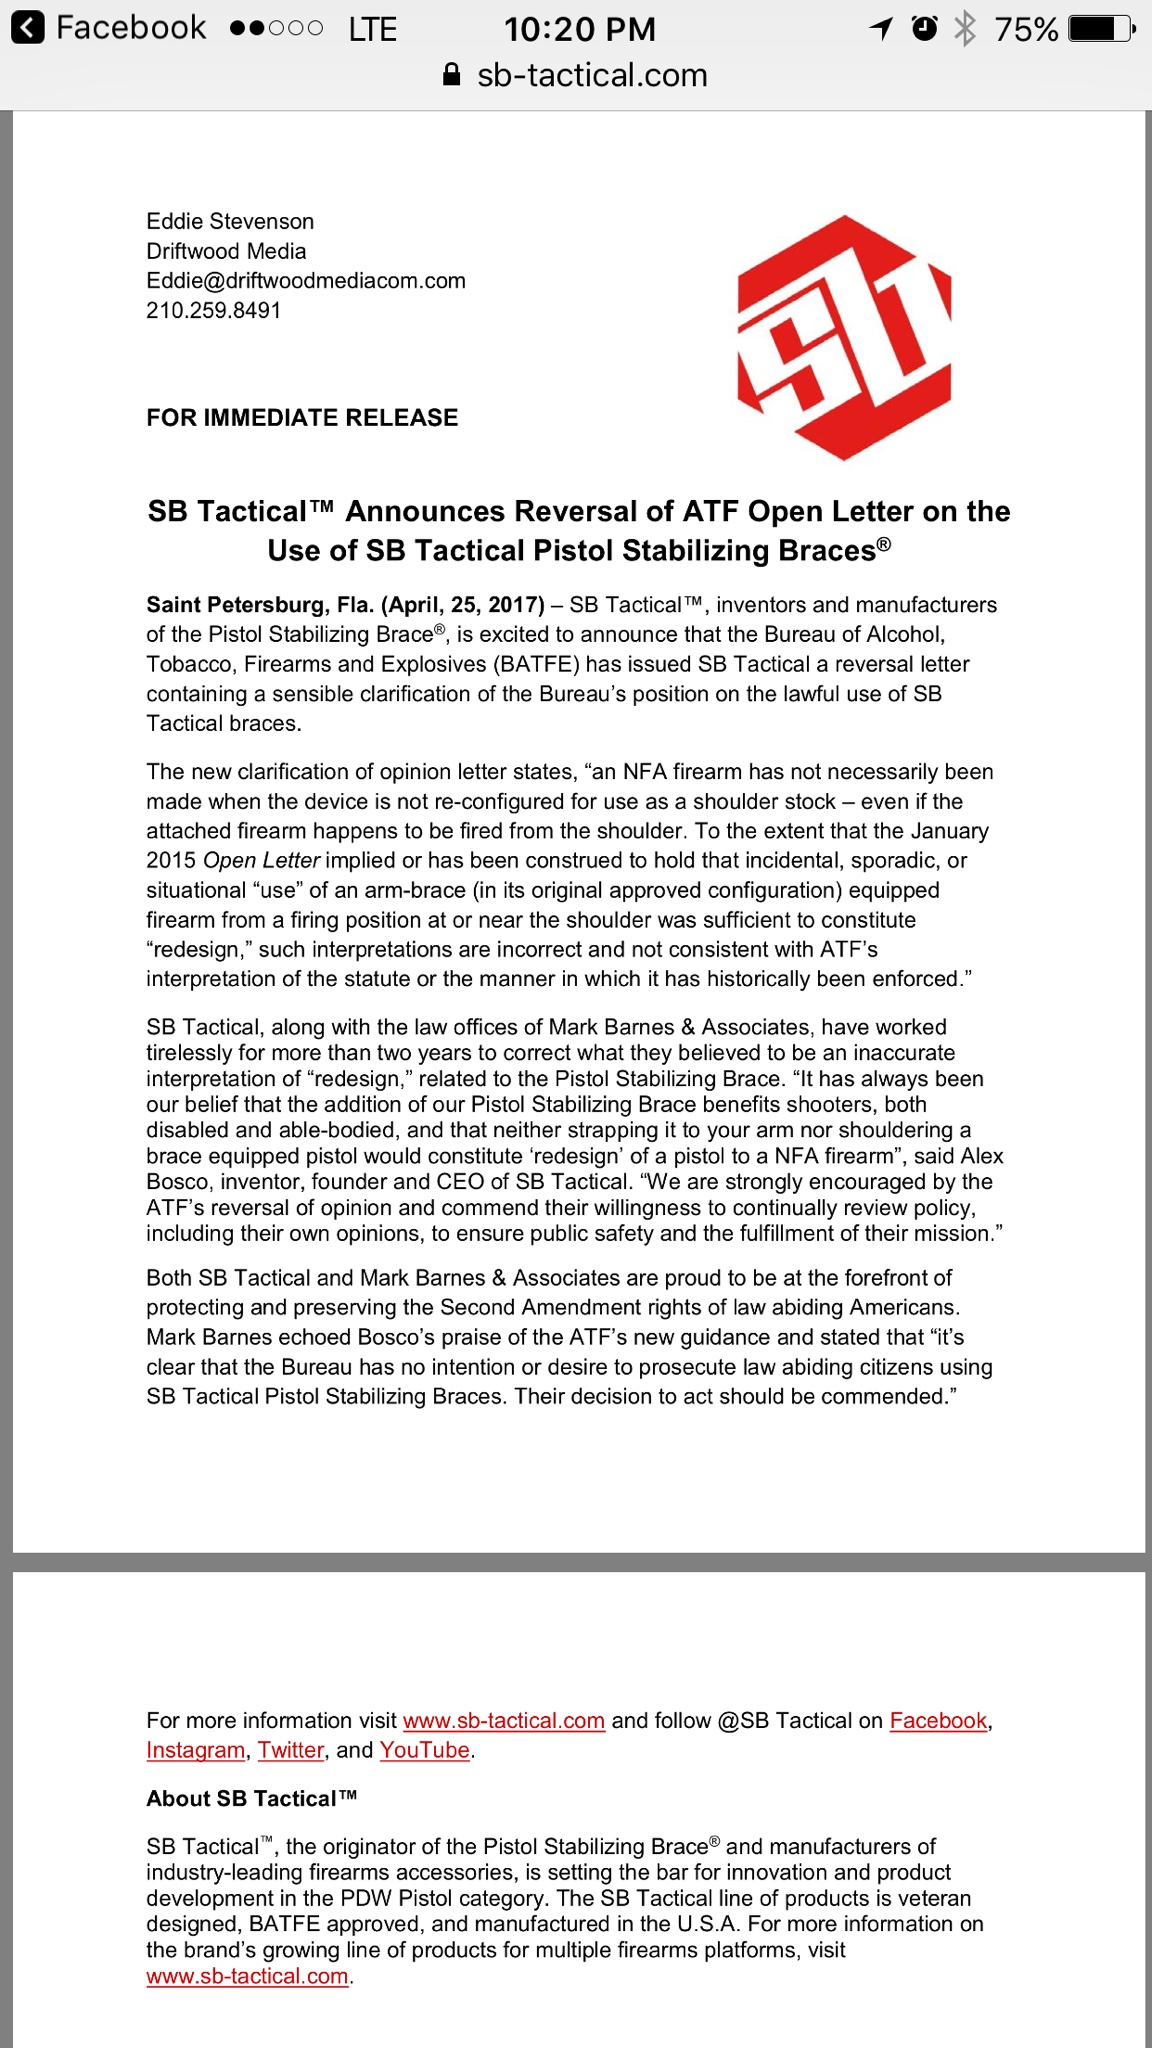 Atf Reversal Letter On Sb Tactical Brace Shouldering